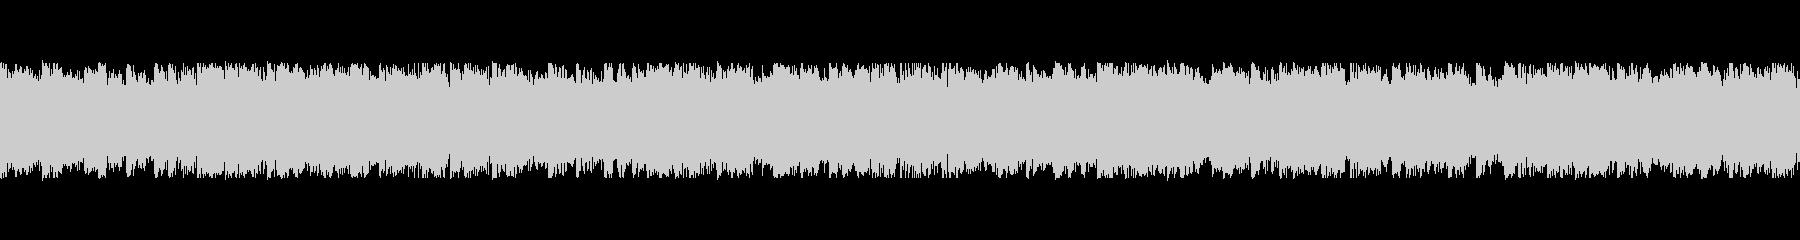 bpm70の壮大で重厚感のあるループ曲の未再生の波形